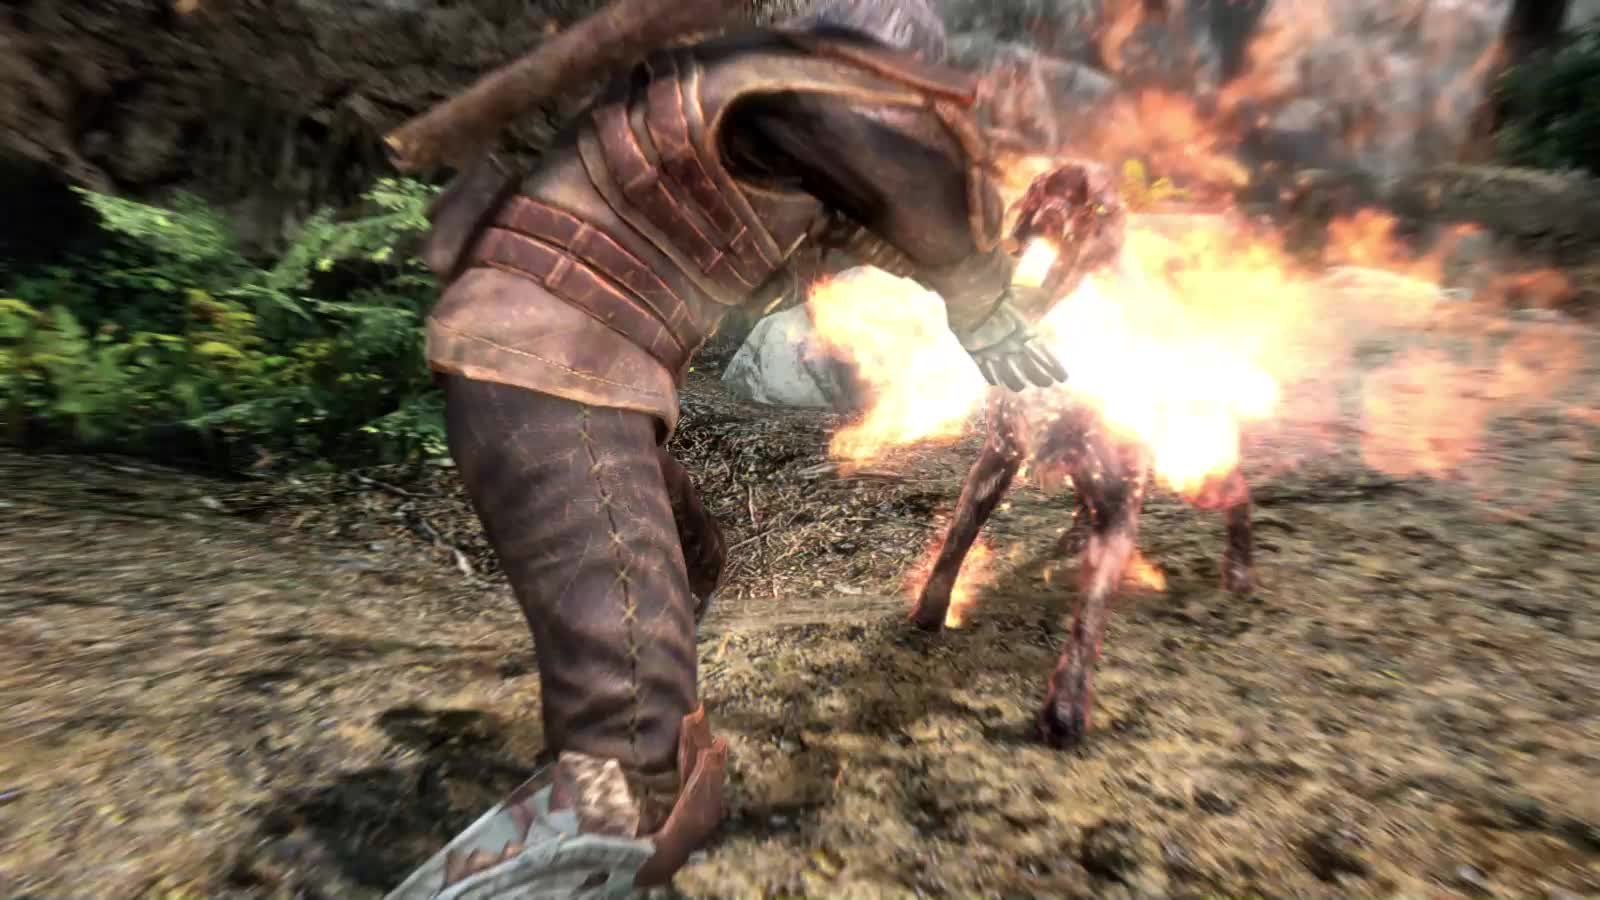 Skyrim, Witcher 3, gaming, Geralt of Rivia doing a Hadouken in Skyrim GIFs